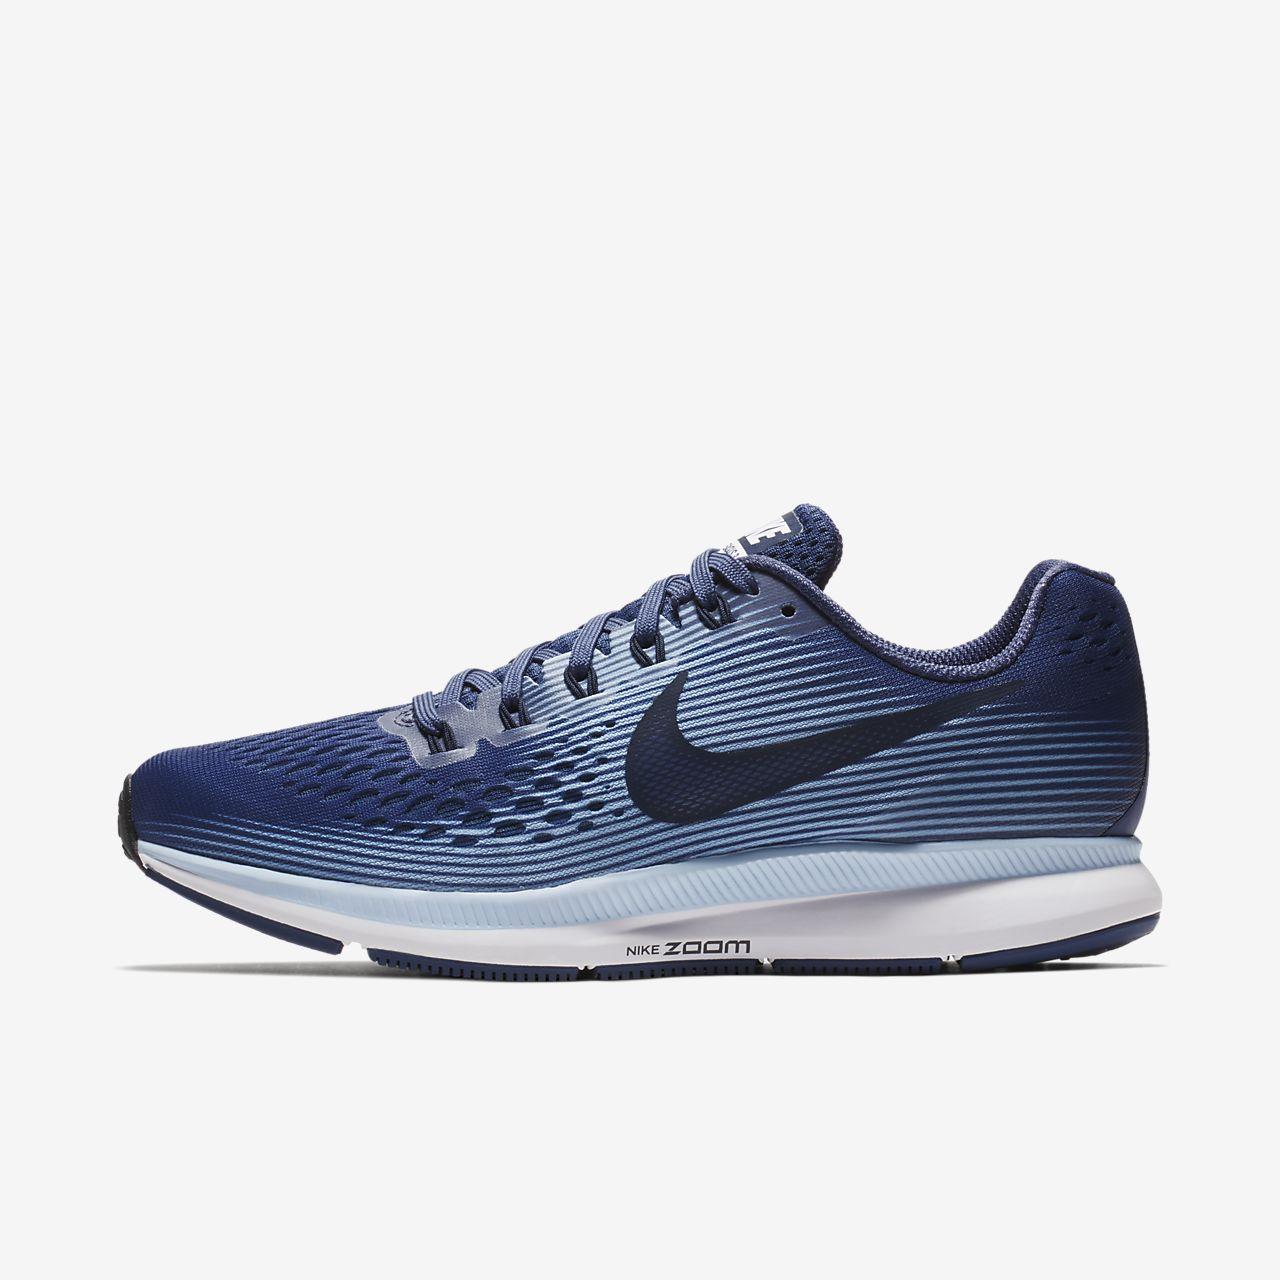 nike shoes 4990 rhode island 931522